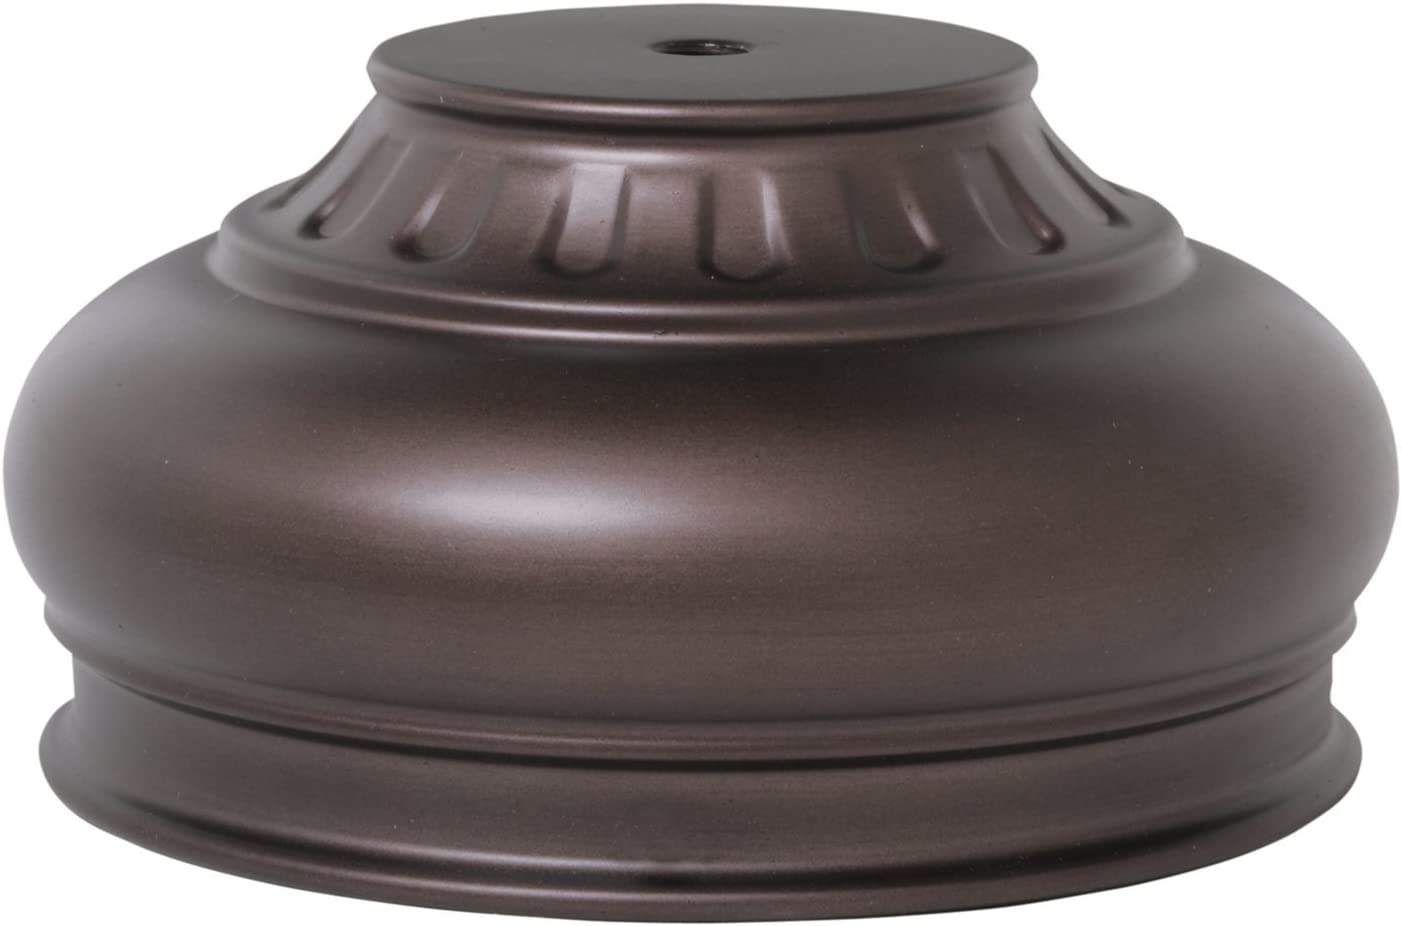 Oil Rubbed Bronze Renewed 18-Inch Long Emerson CFDR18ORB Ceiling Fan Downrod